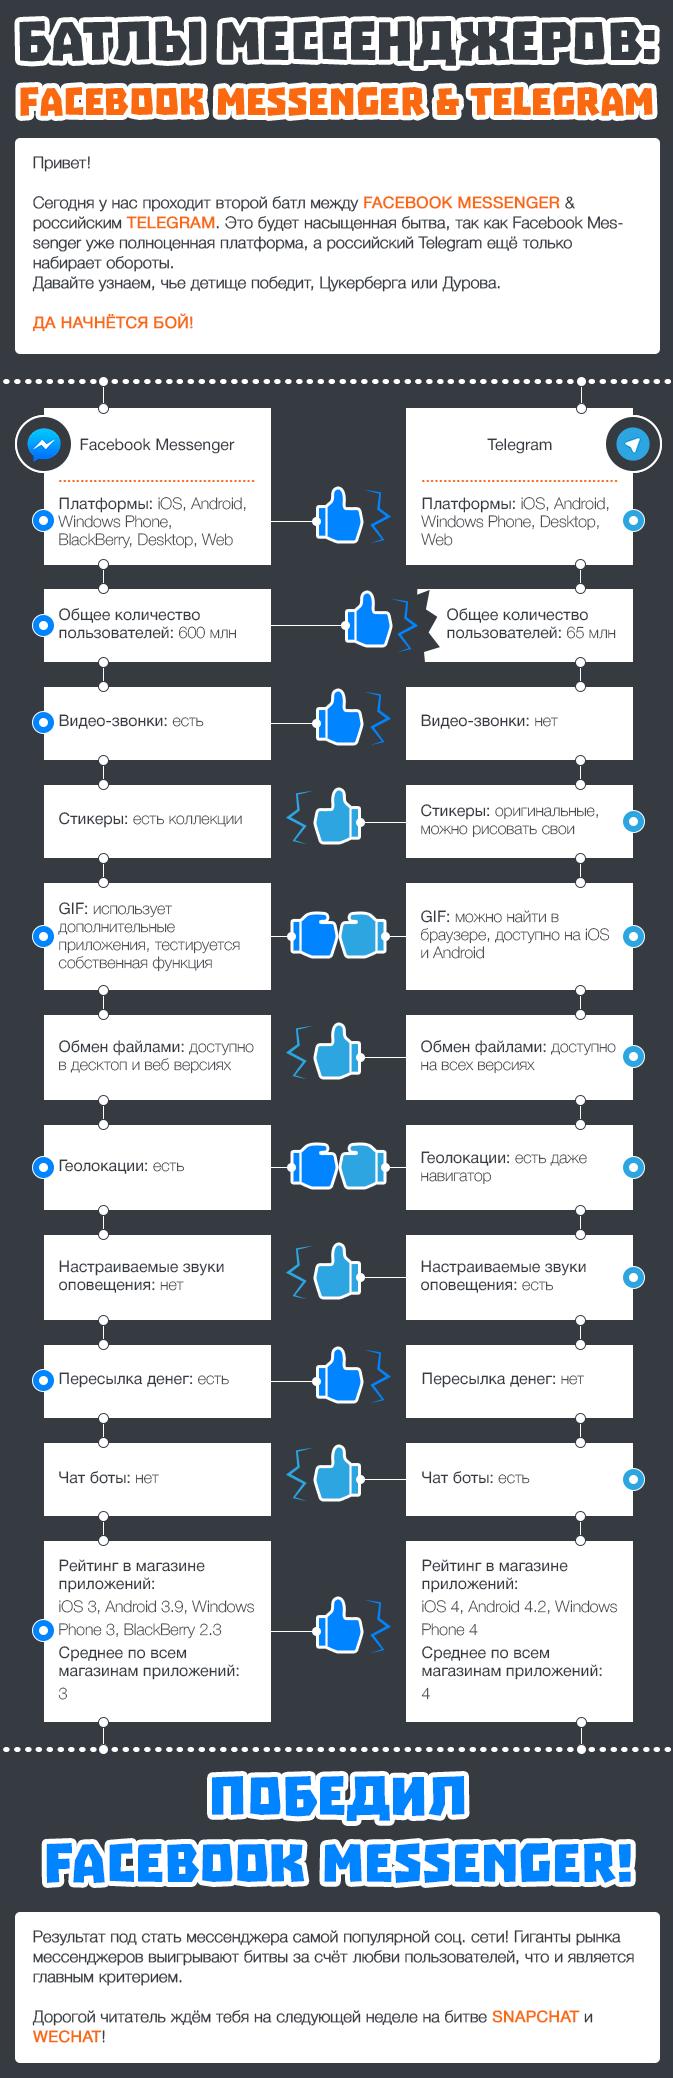 Батлы мессенджеров Facebook Messenger & Telegram